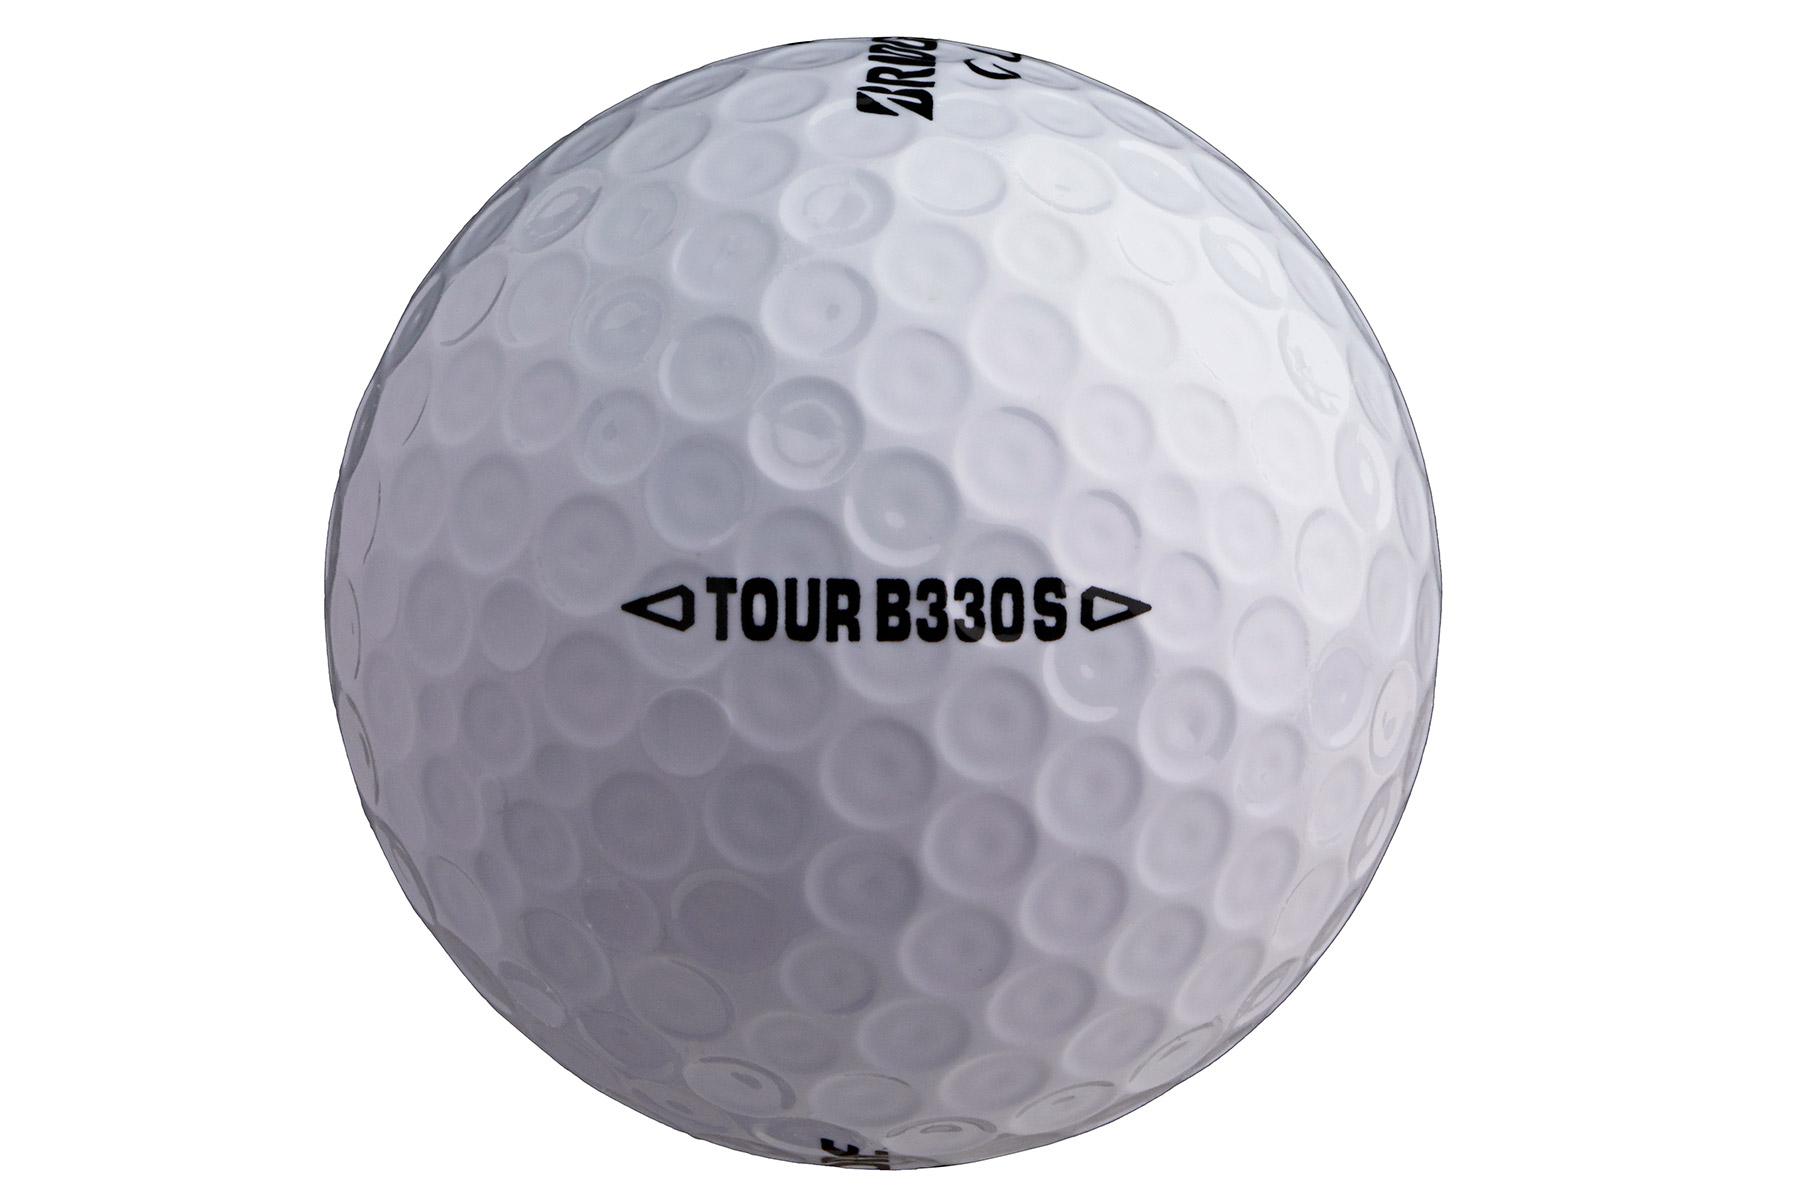 Bridgestone golf b s ball pack from american